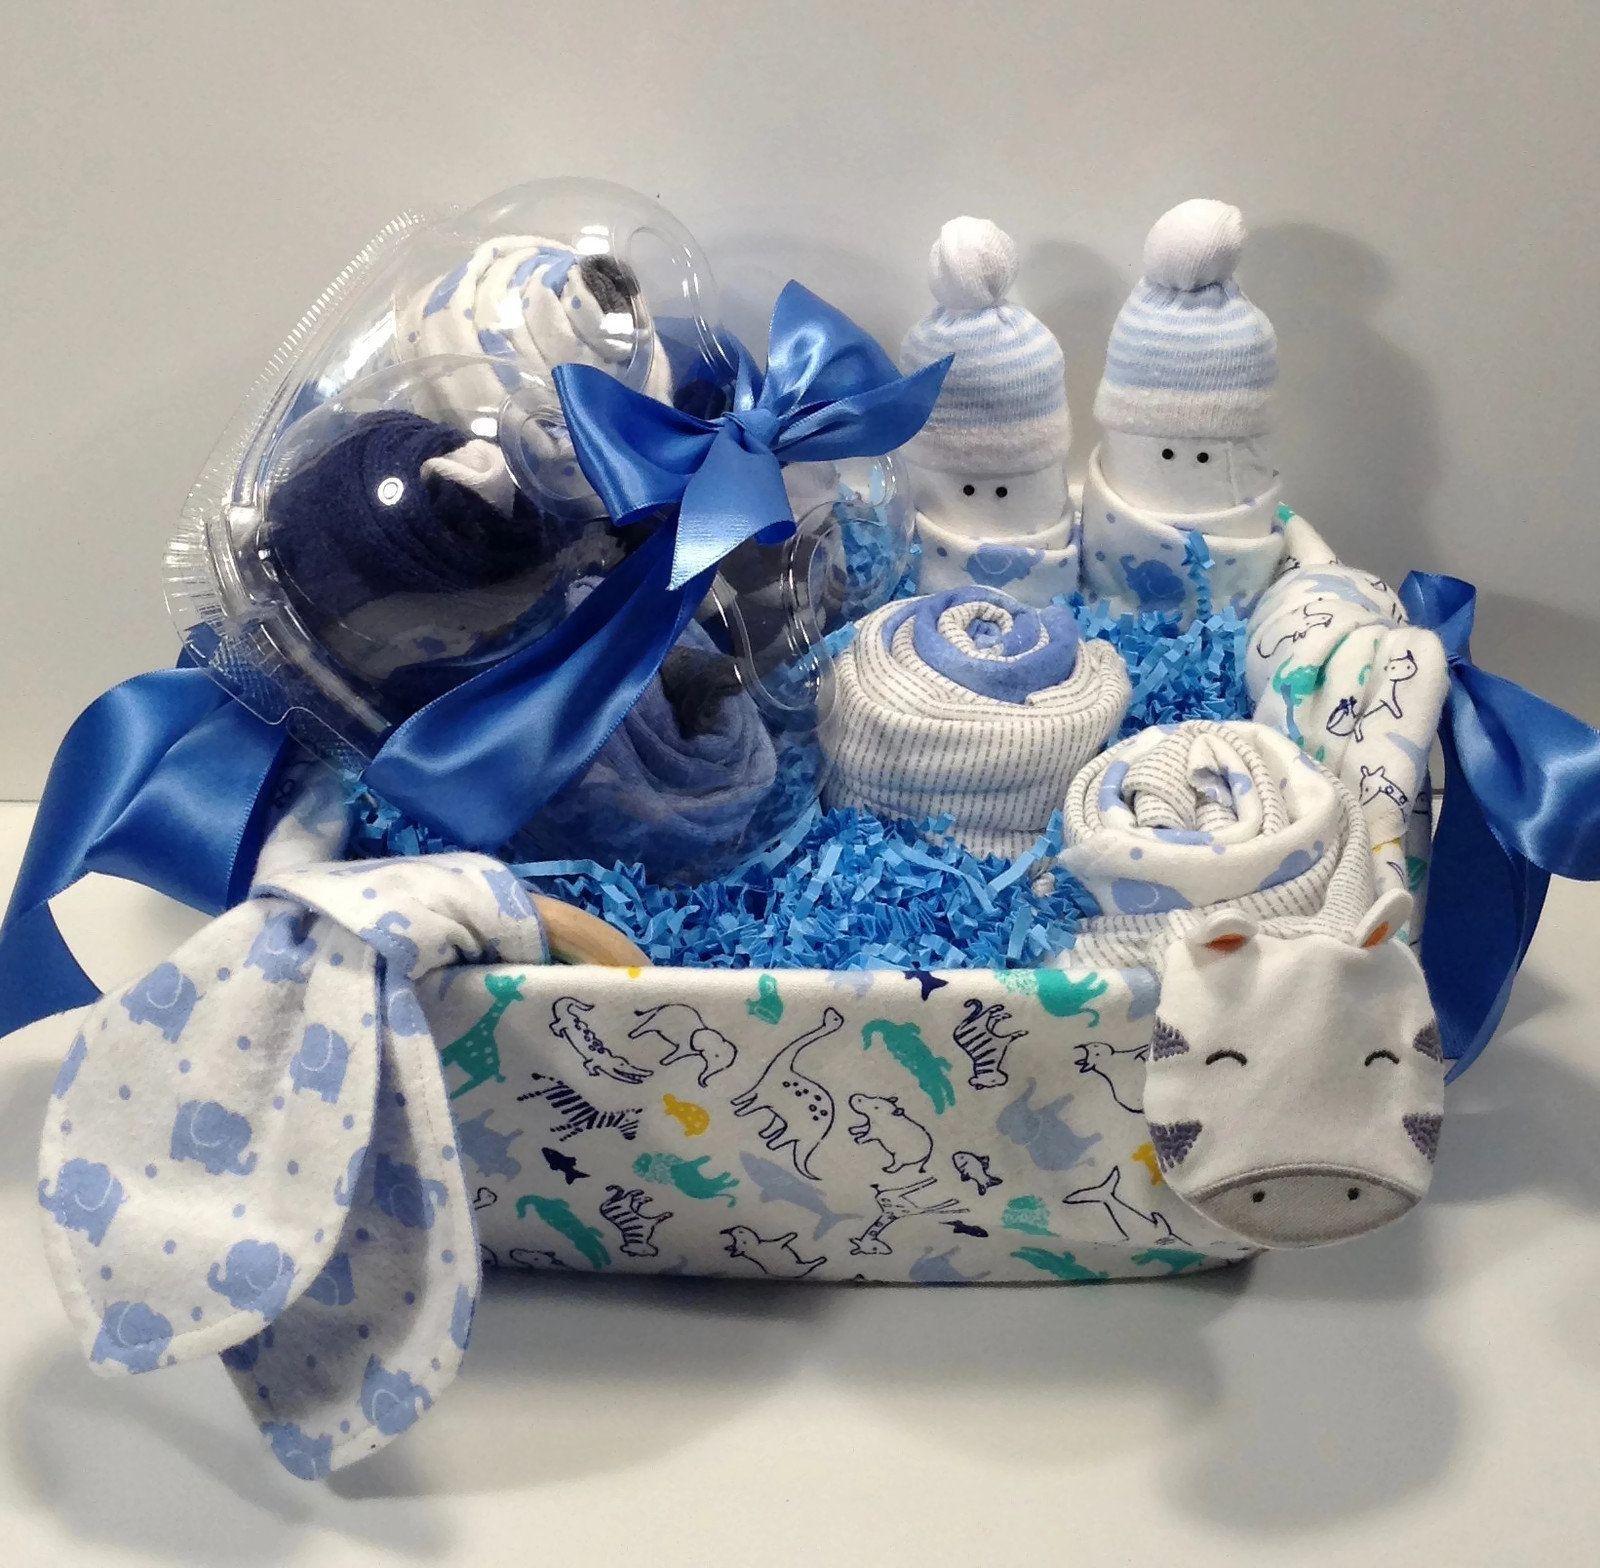 Baby Boy Gift Basket New Mom Gift Basket Baby Shower Gift Best Baby Gift New Baby Boy By Edieslegac Baby Boy Gift Baskets Baby Boy Gifts Gifts For New Moms